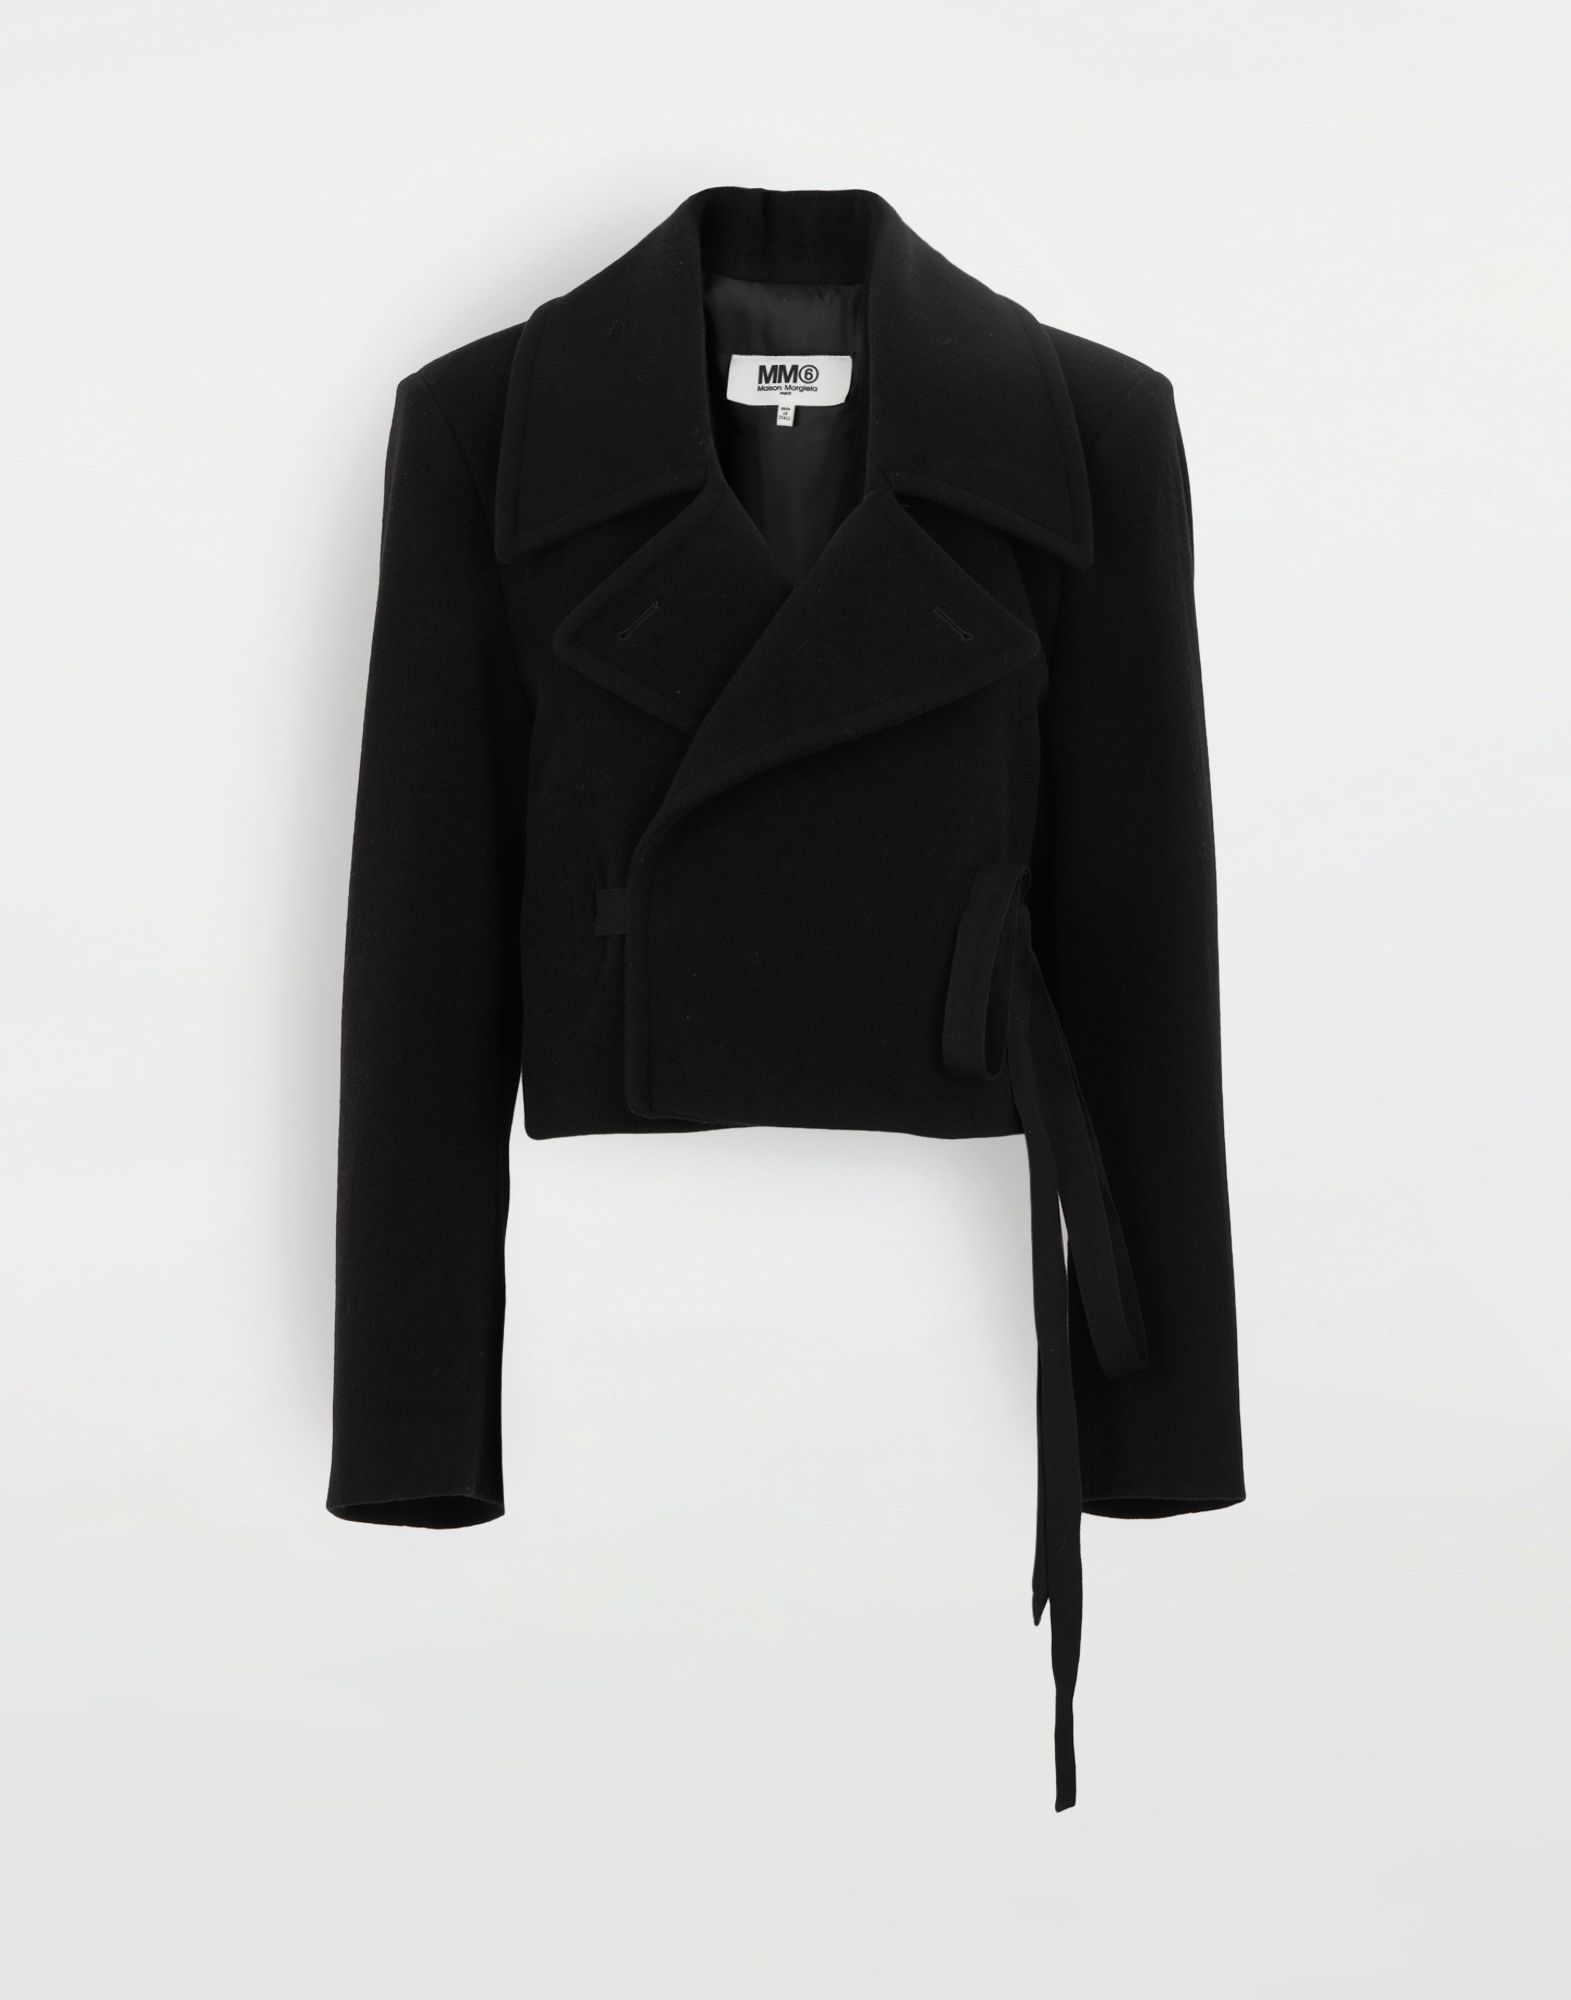 MM6 MAISON MARGIELA Jacket with strings Jacket Woman f